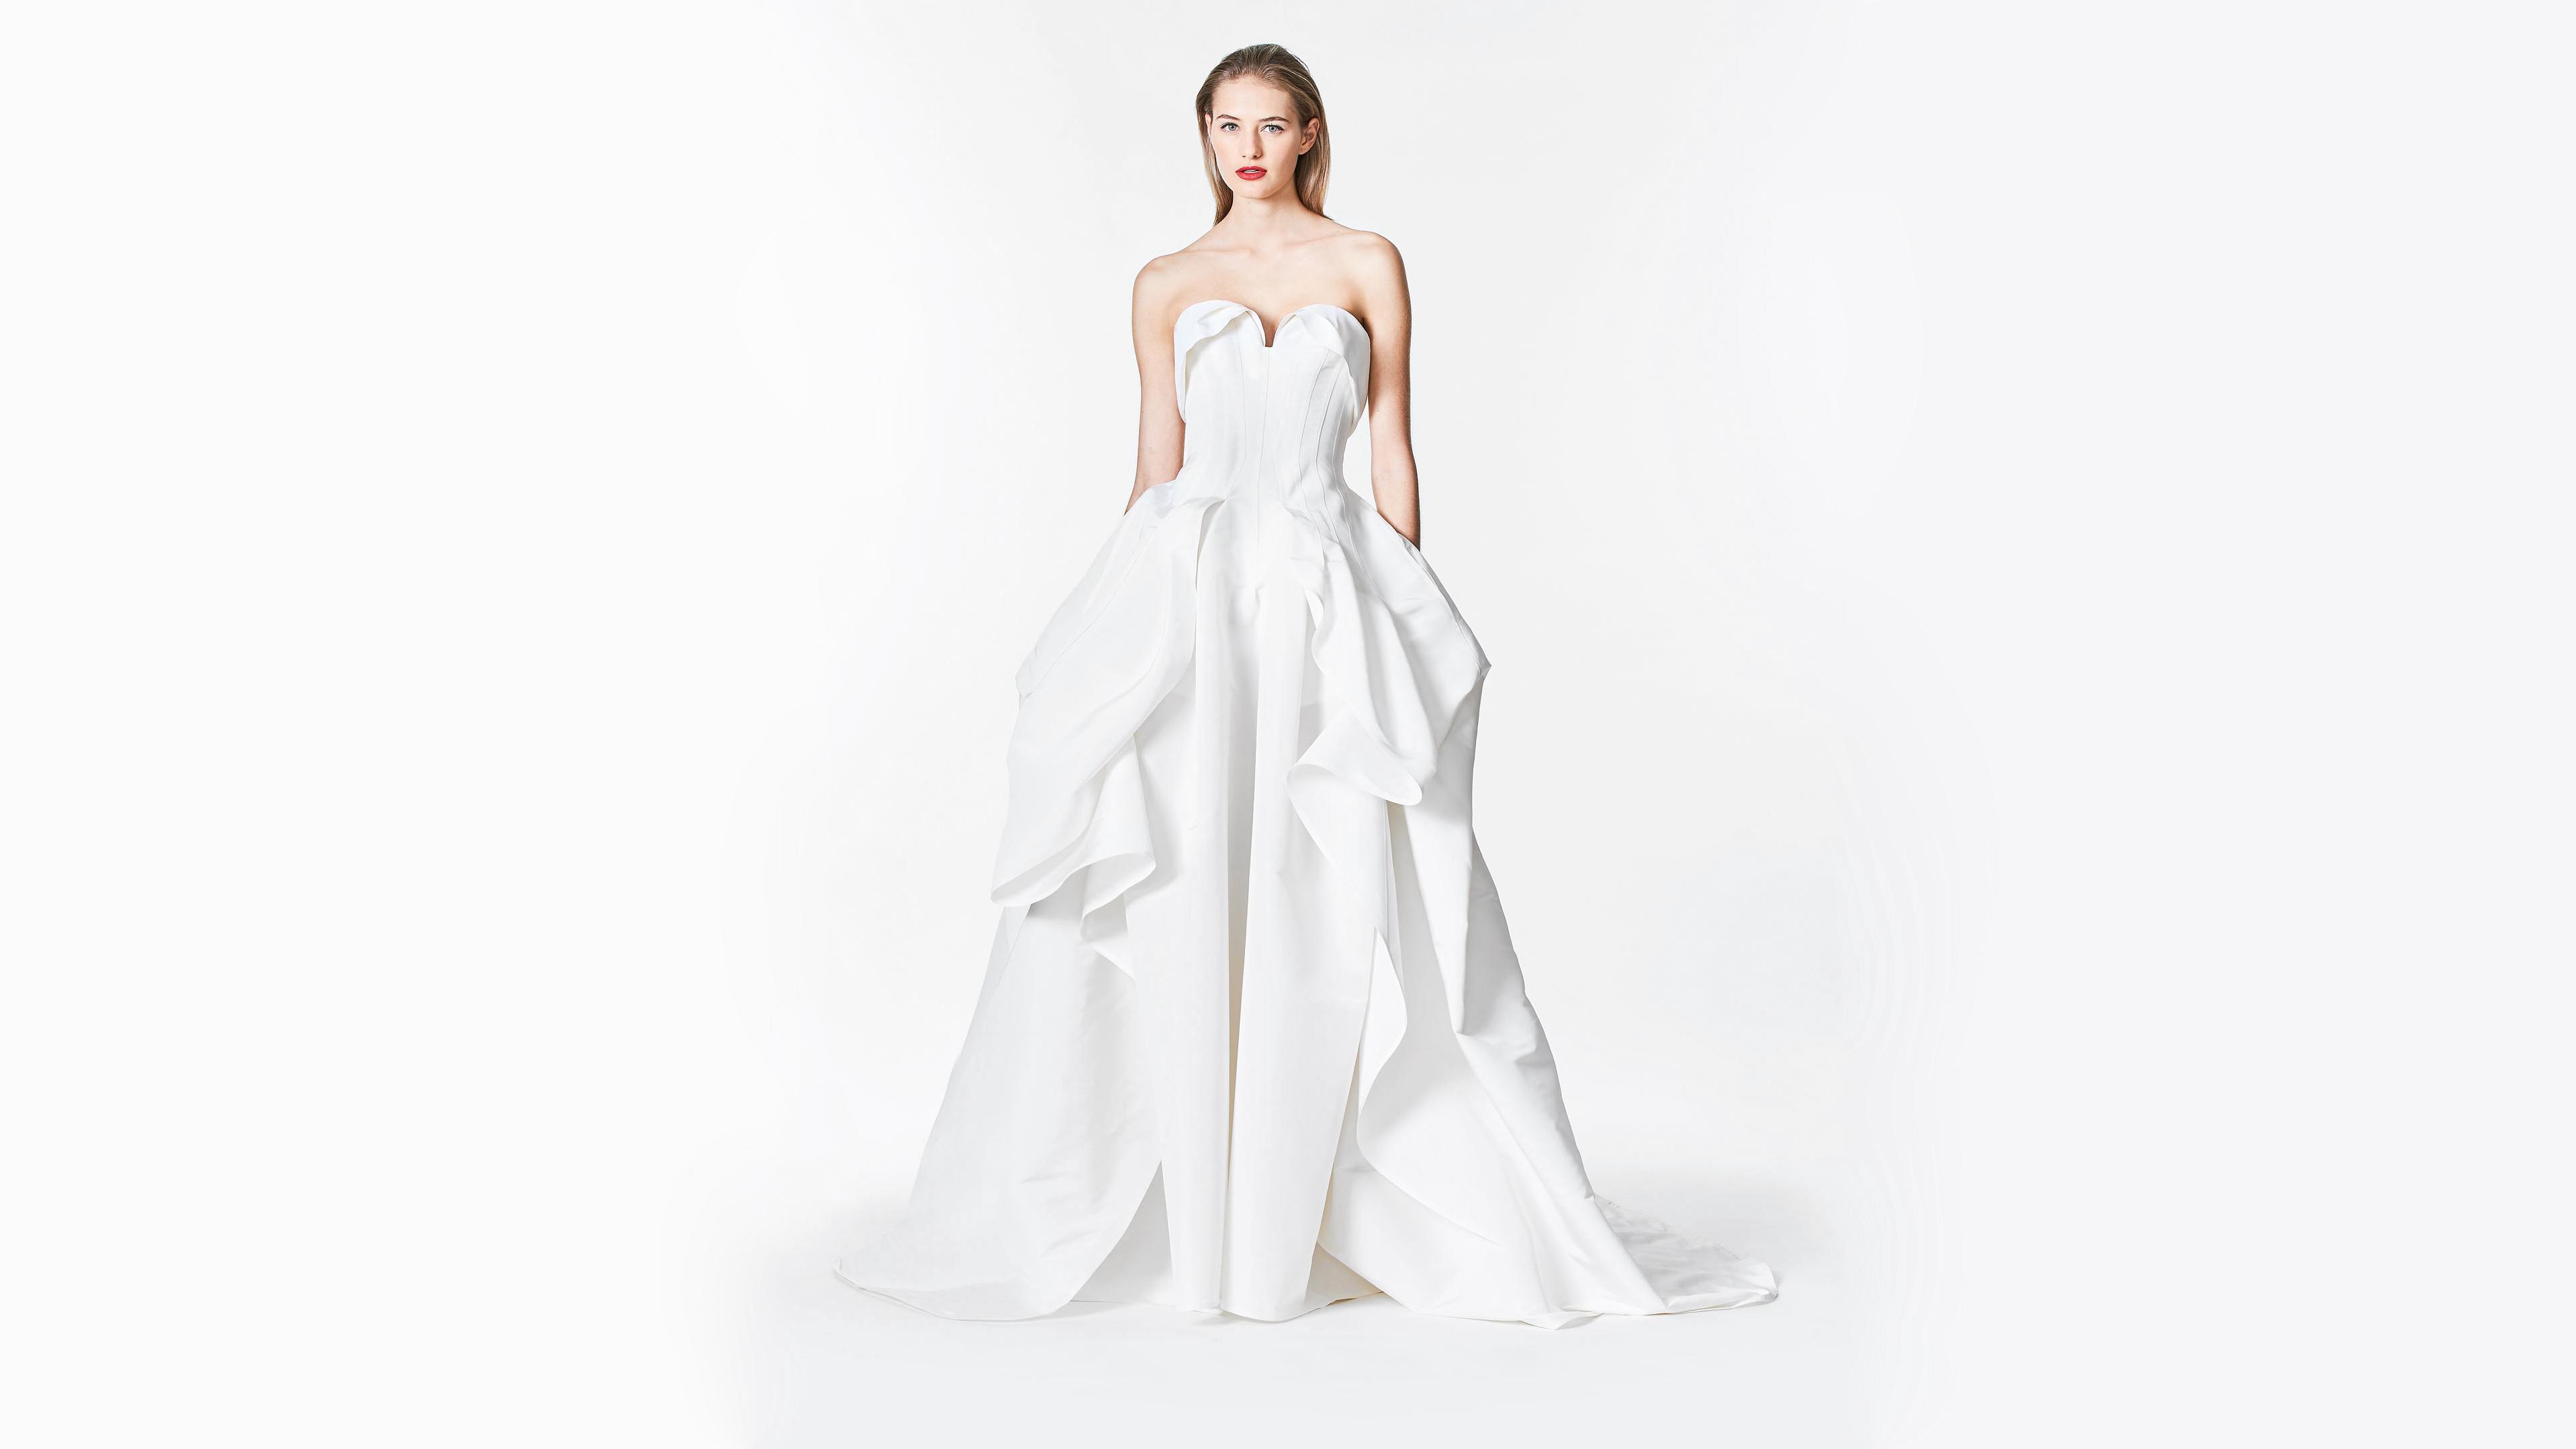 carolina herrera fall 2017 sweatheart white wedding dress